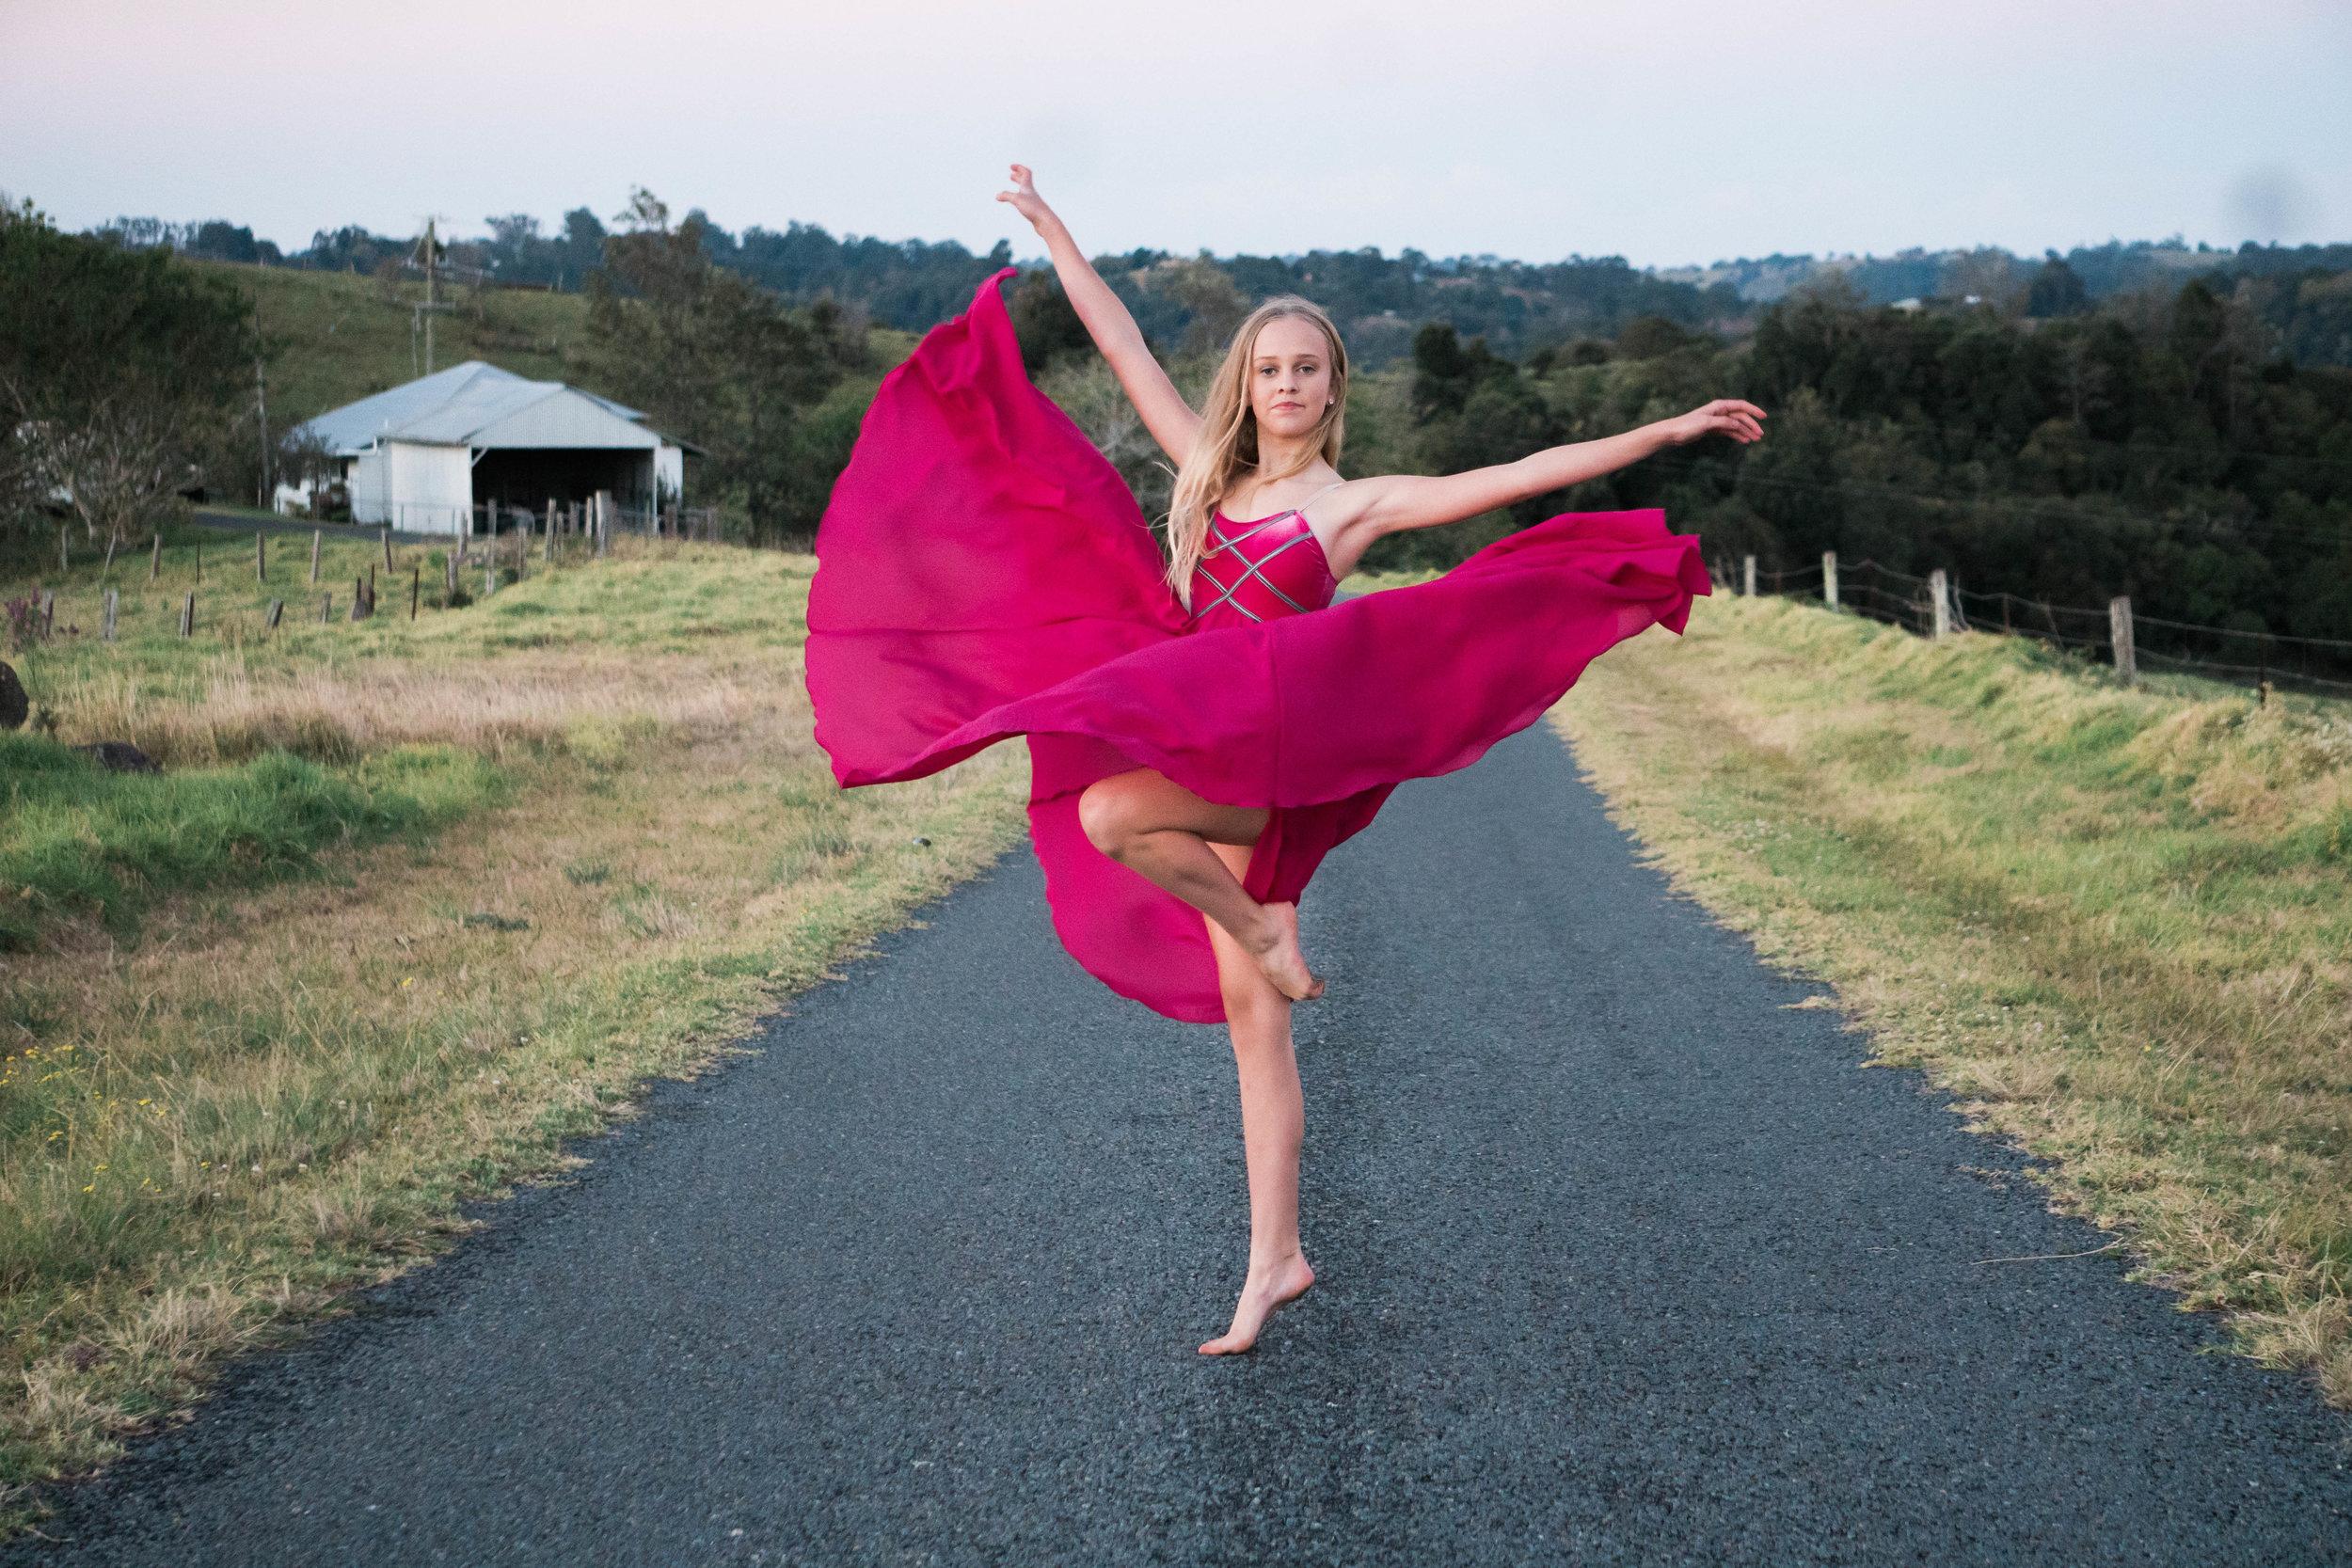 Hinterland-Dance-20.08.17-59.jpg